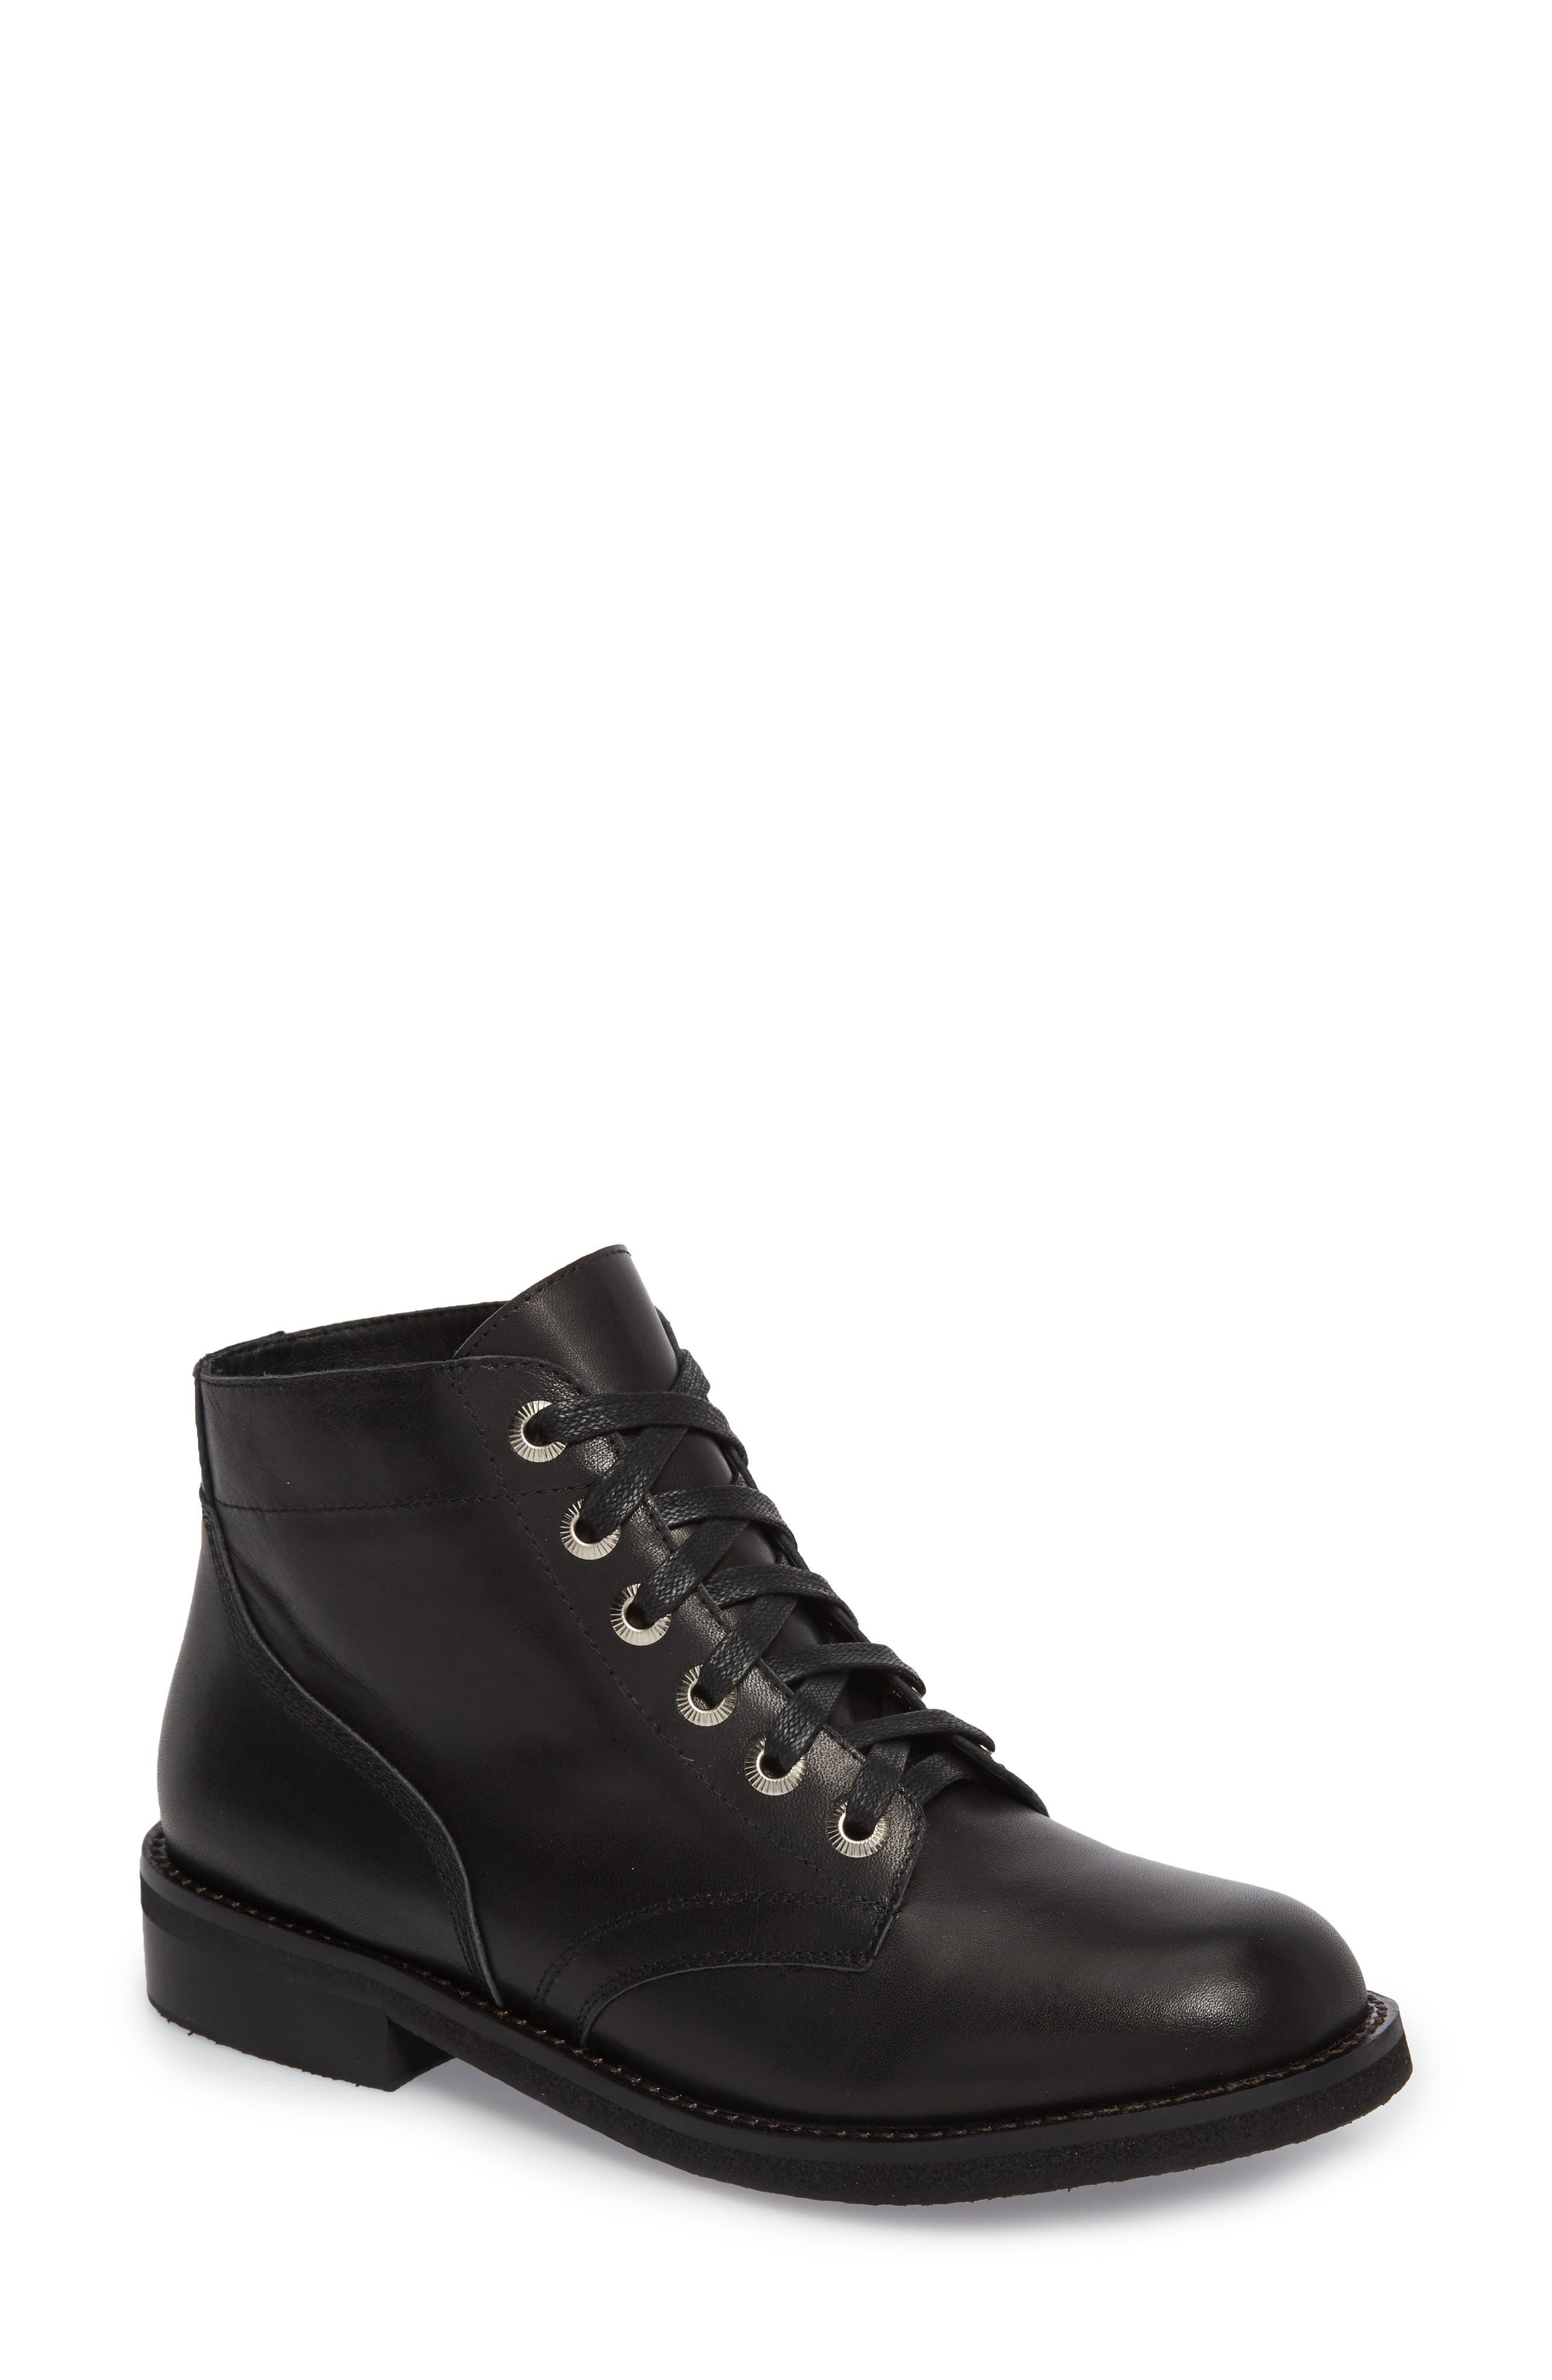 James Combat Boot,                         Main,                         color, 001